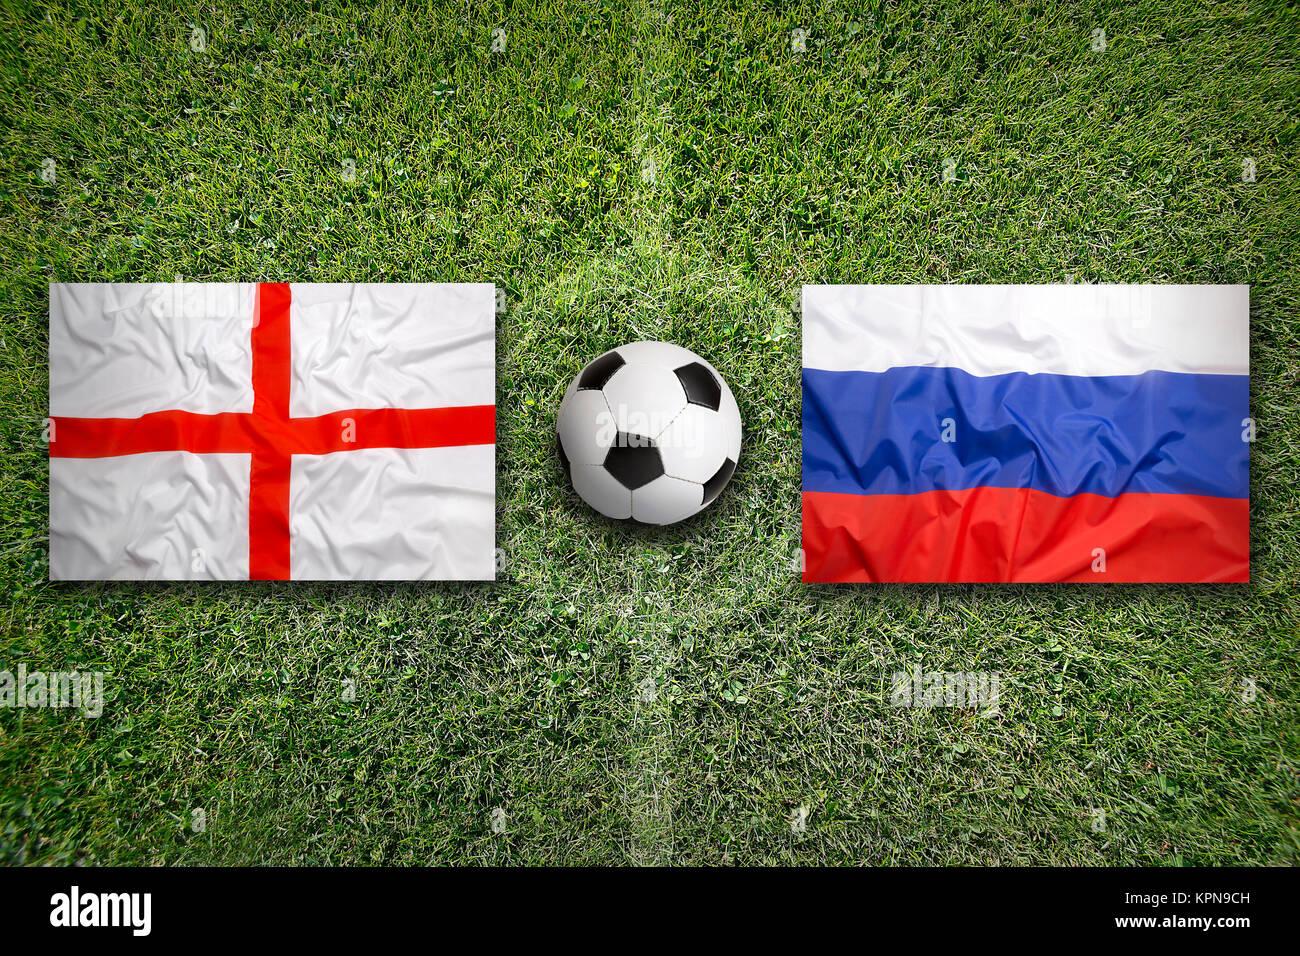 england vs island